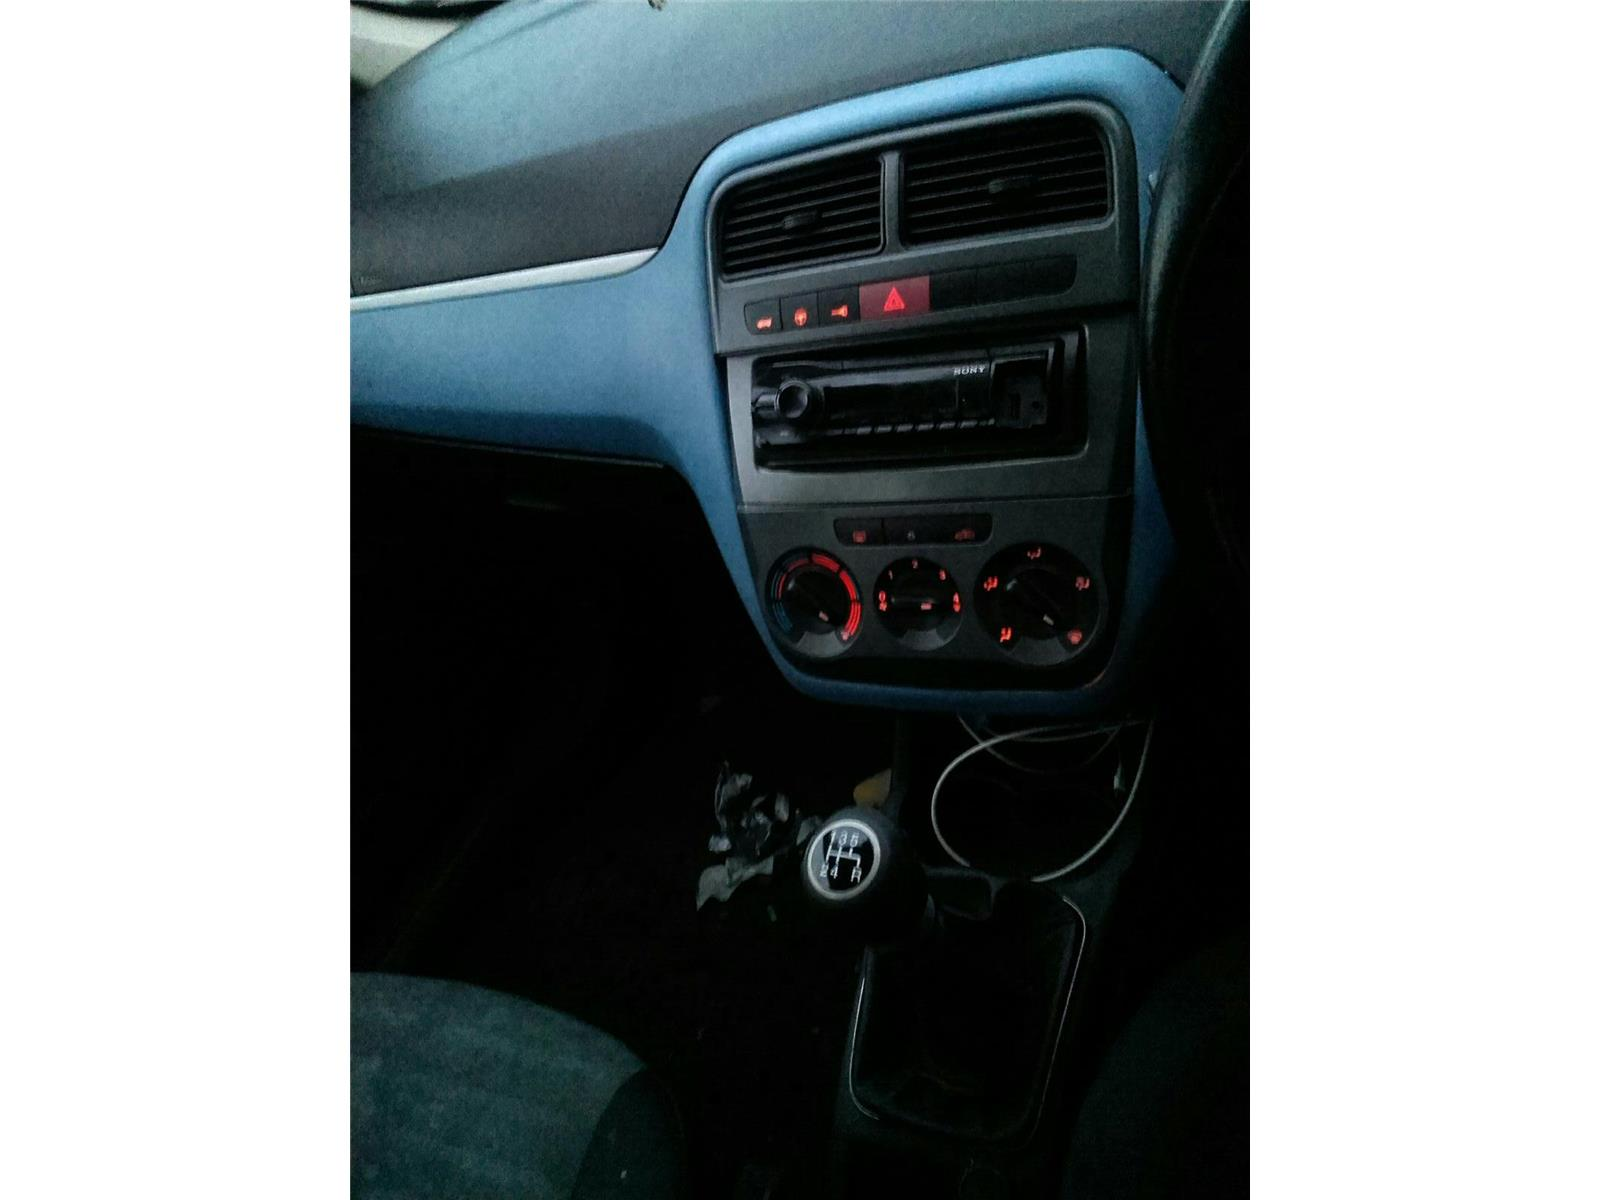 2006 Fiat Grande Punto To 2008 Dynamic 12cc Manual Petrol Fuse Box 1630 Parts Matching